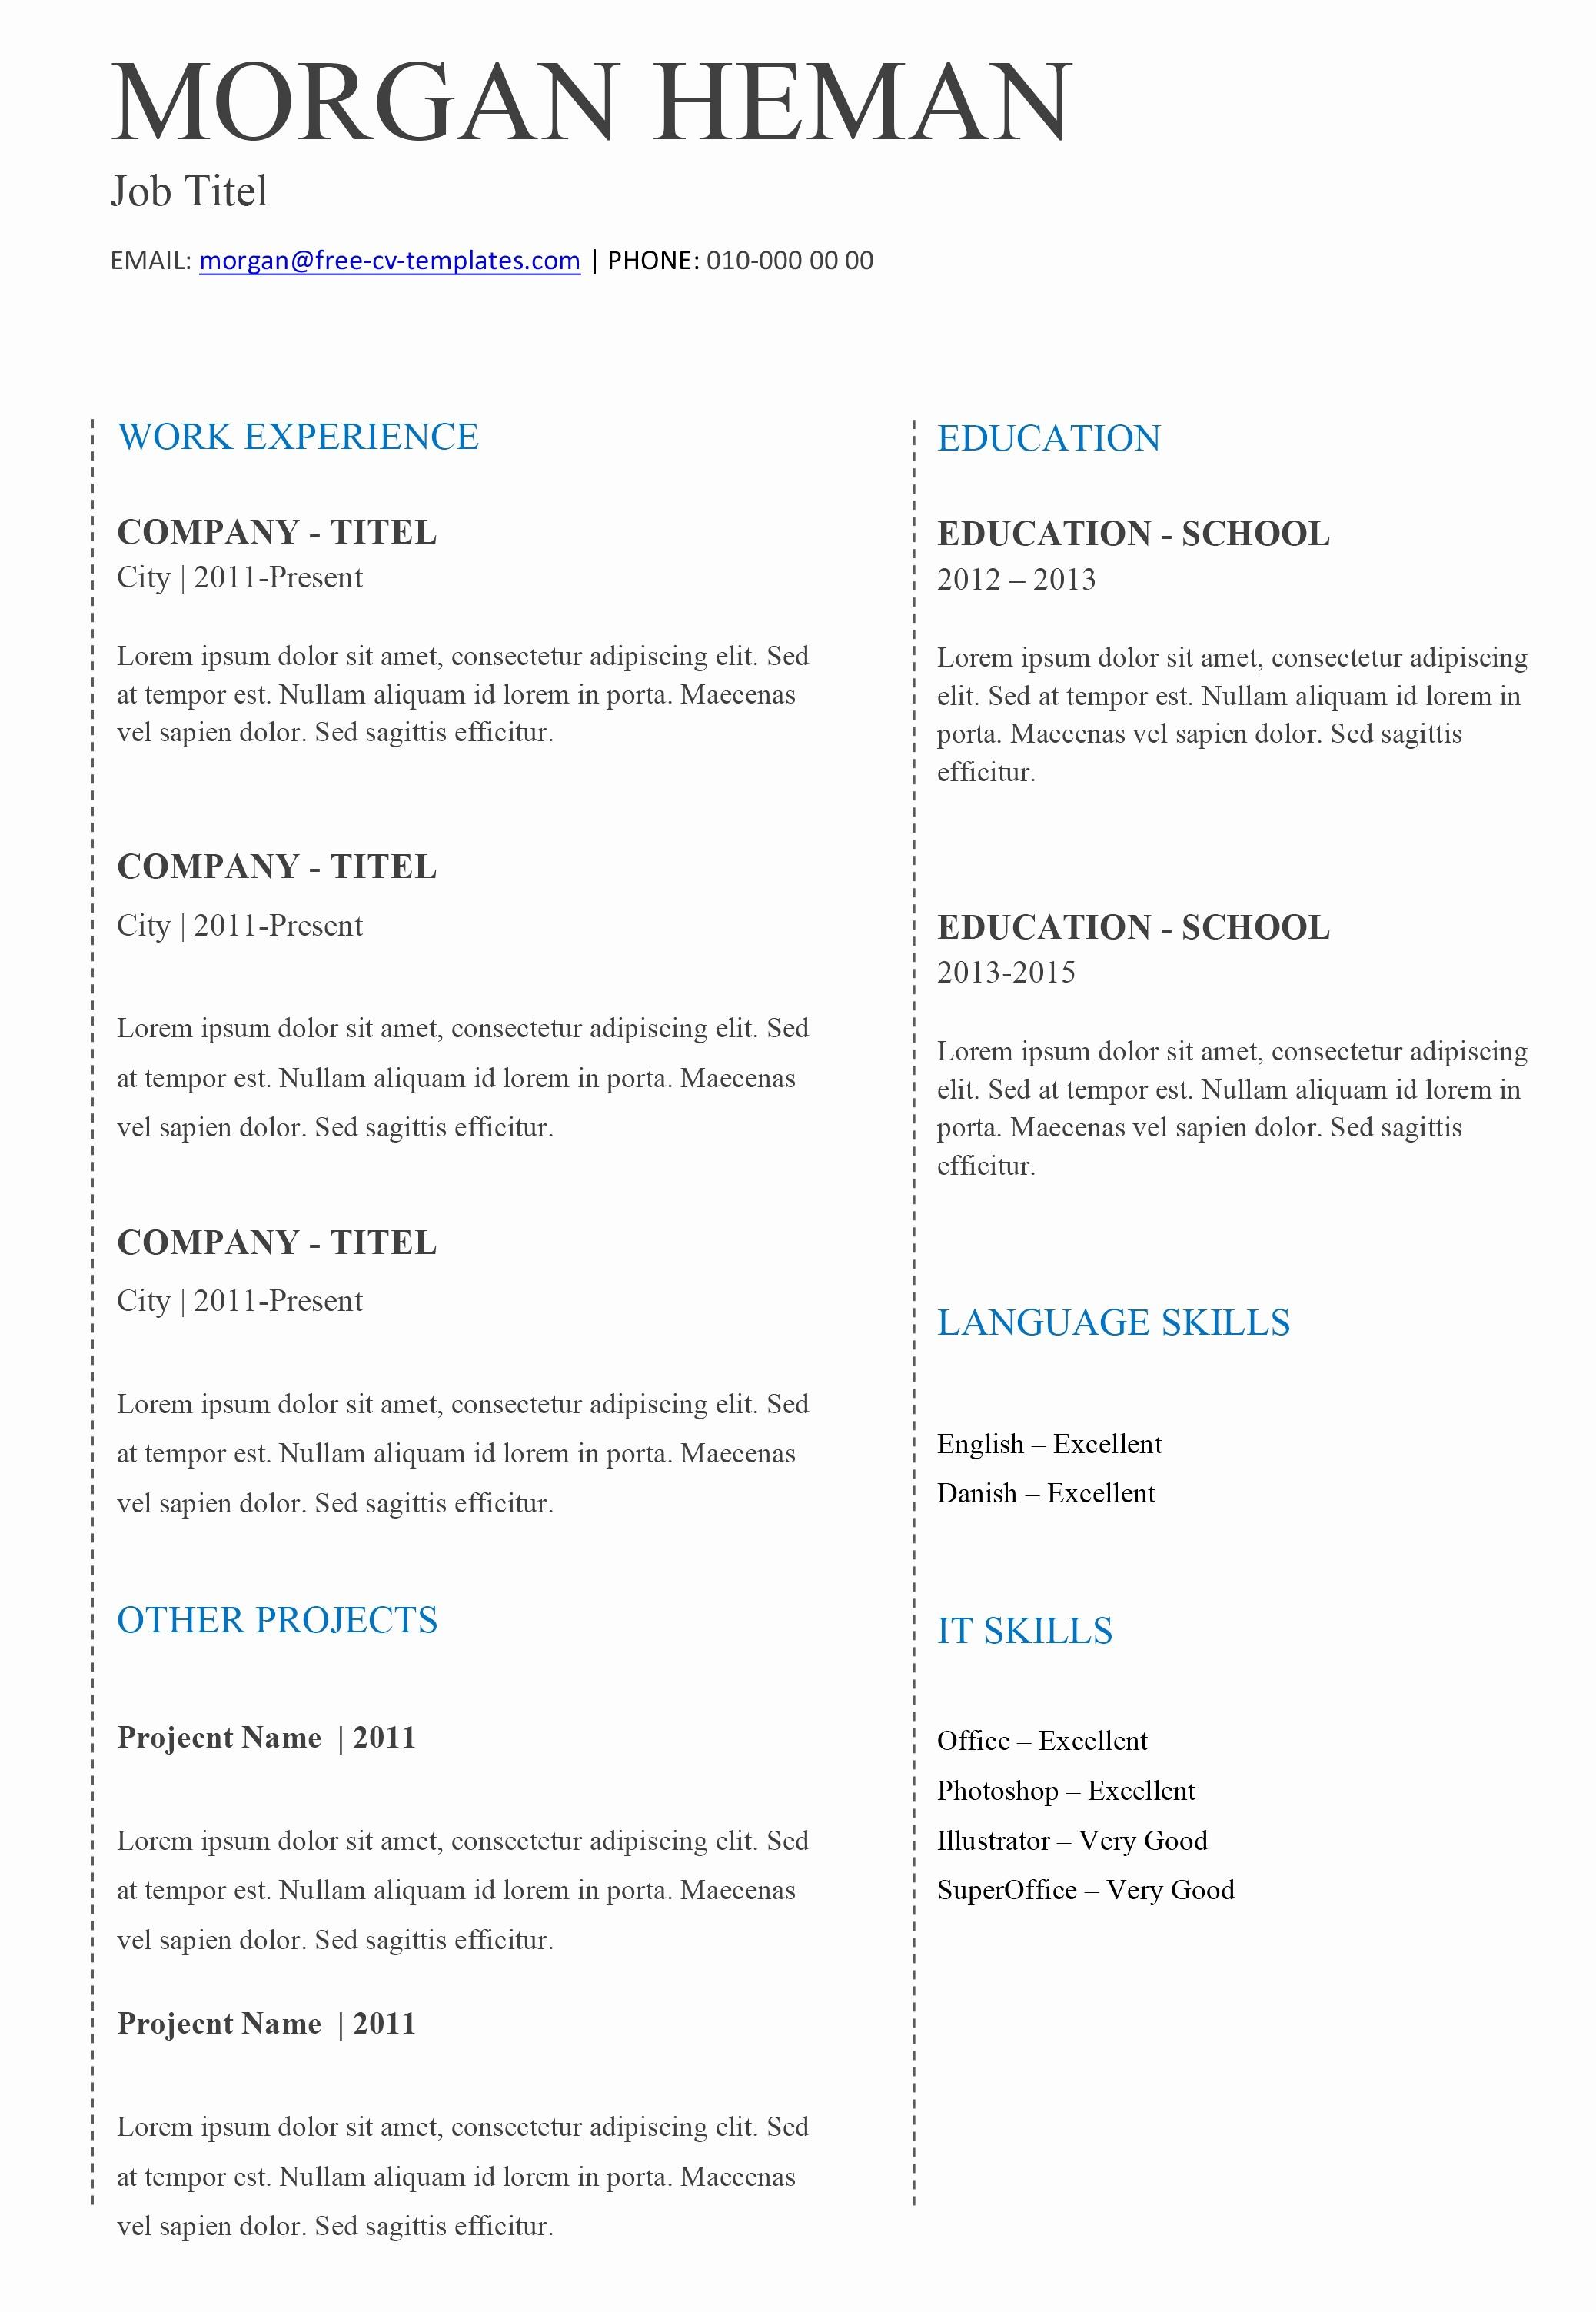 Microsoft Word 2003 Resume Templates Luxury Microsoft Word 2003 Resume Templates Inspirational 5